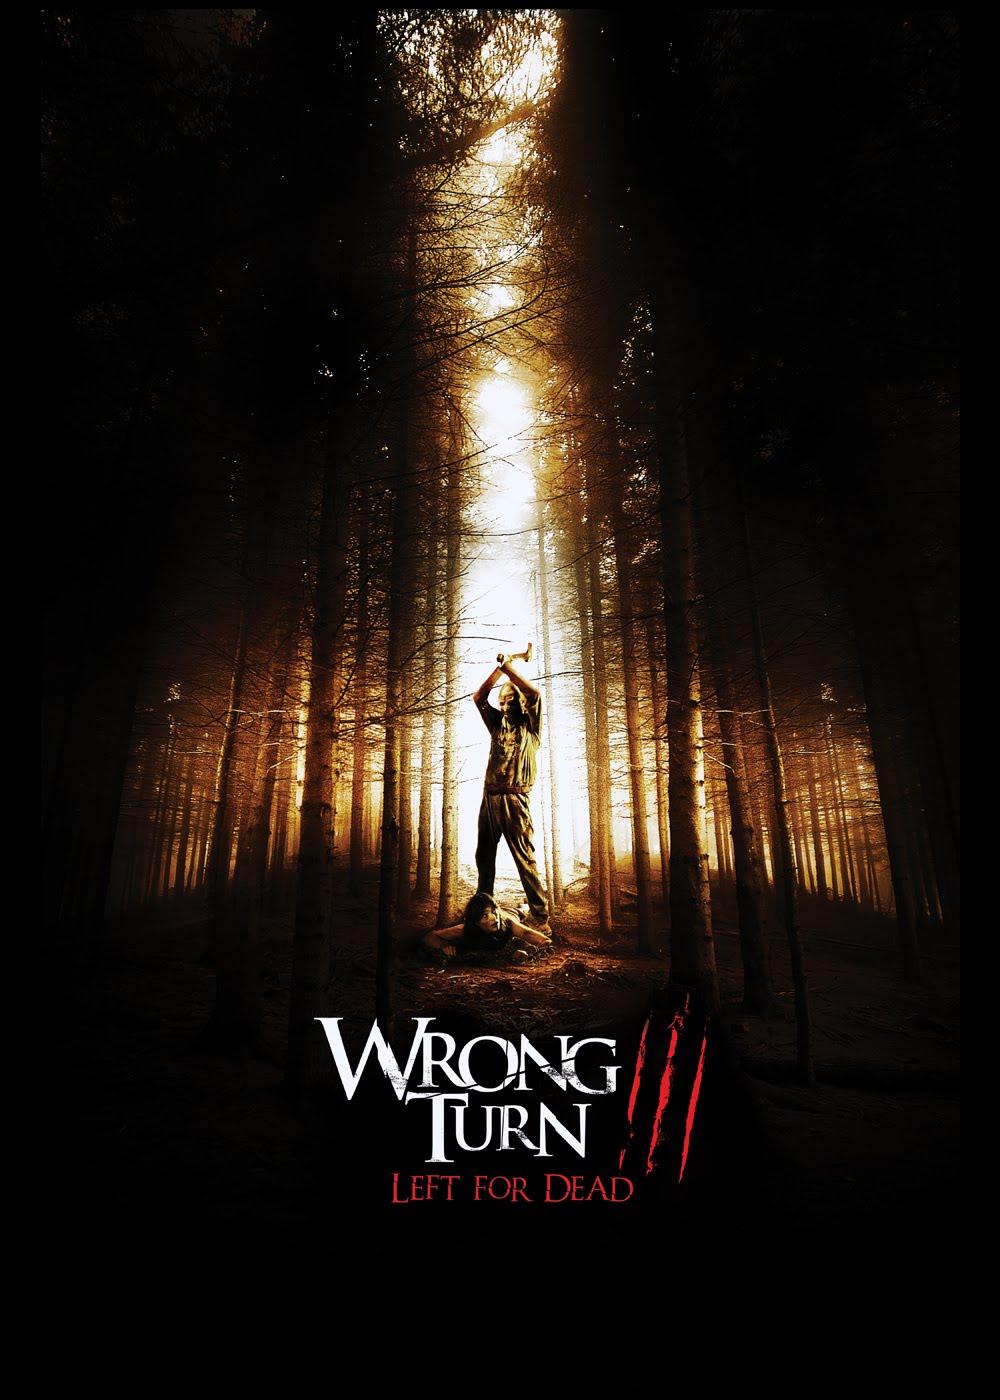 wrong turn 4 movie download